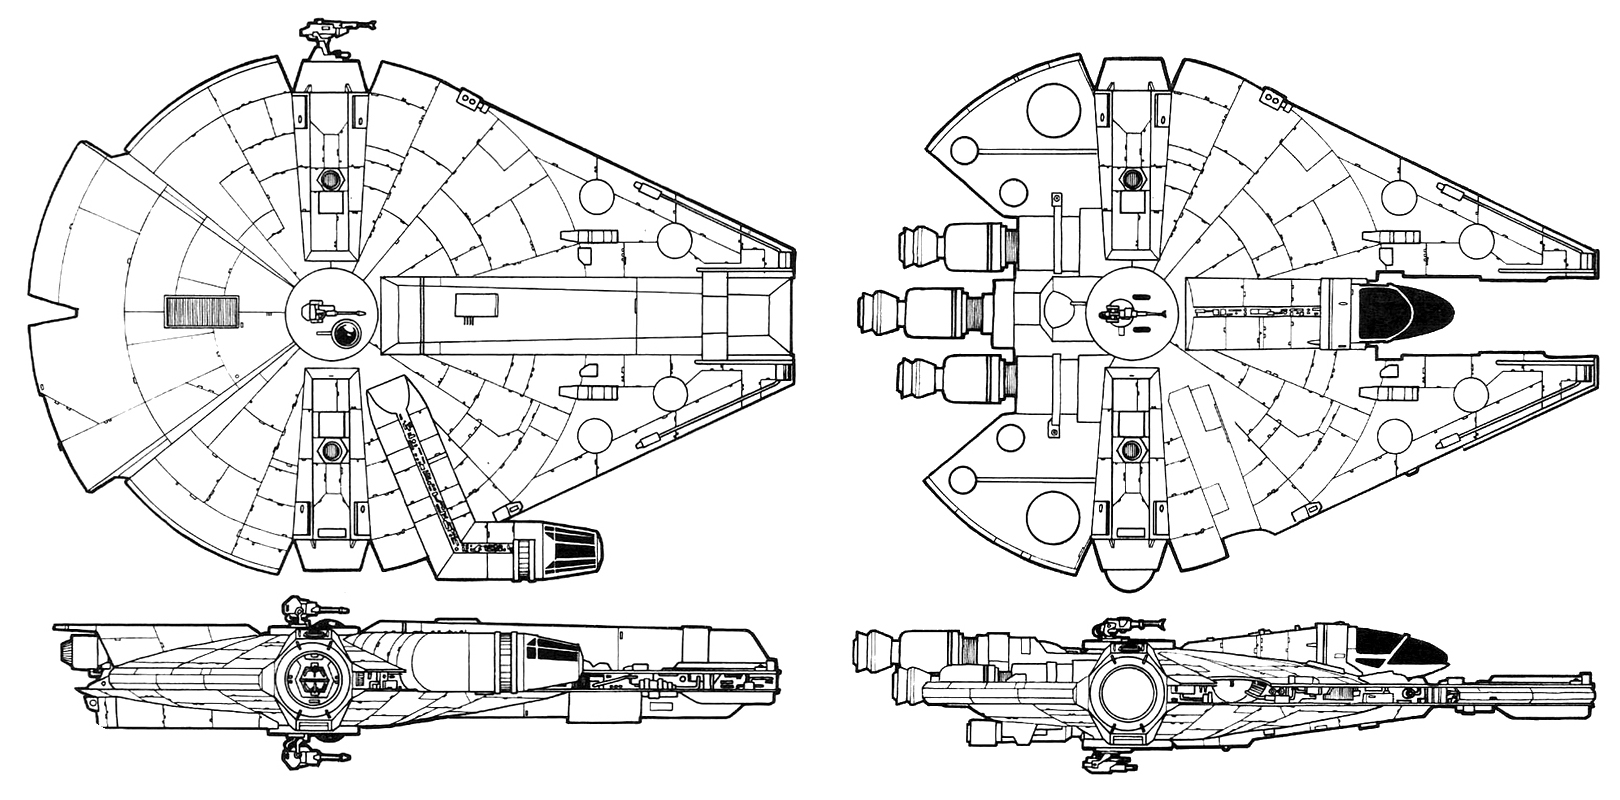 Landos Millennium Falcon Starwars